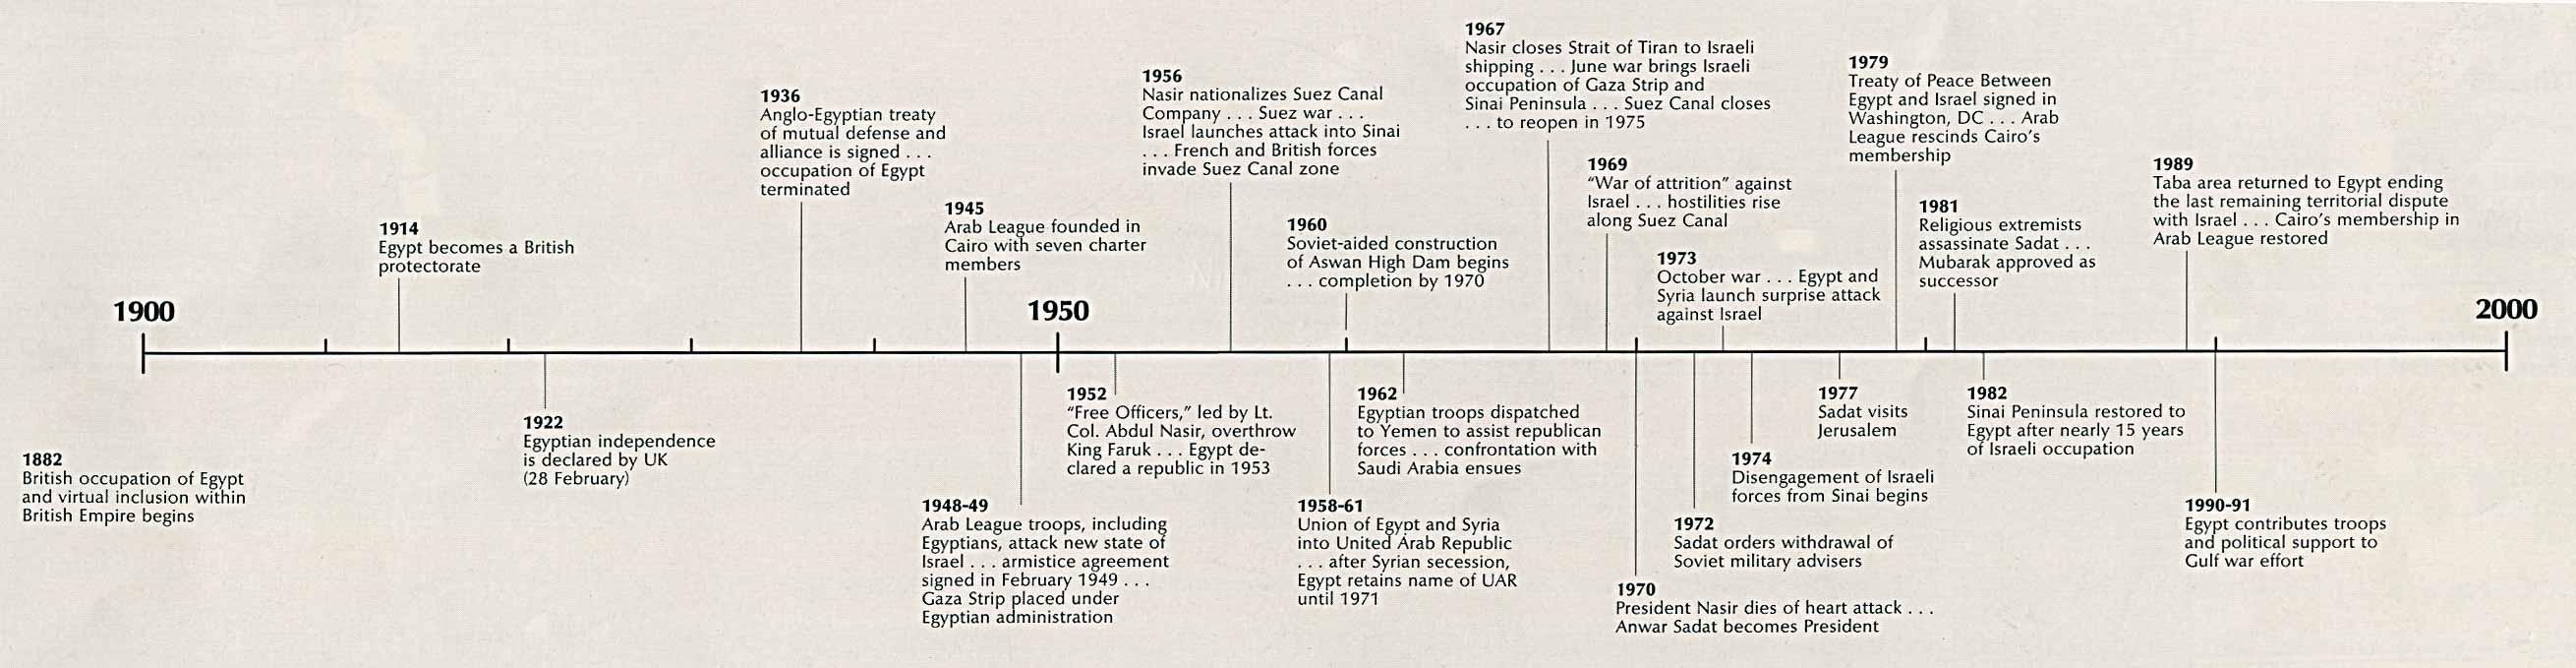 pics photos ancient egypt timeline history timeline